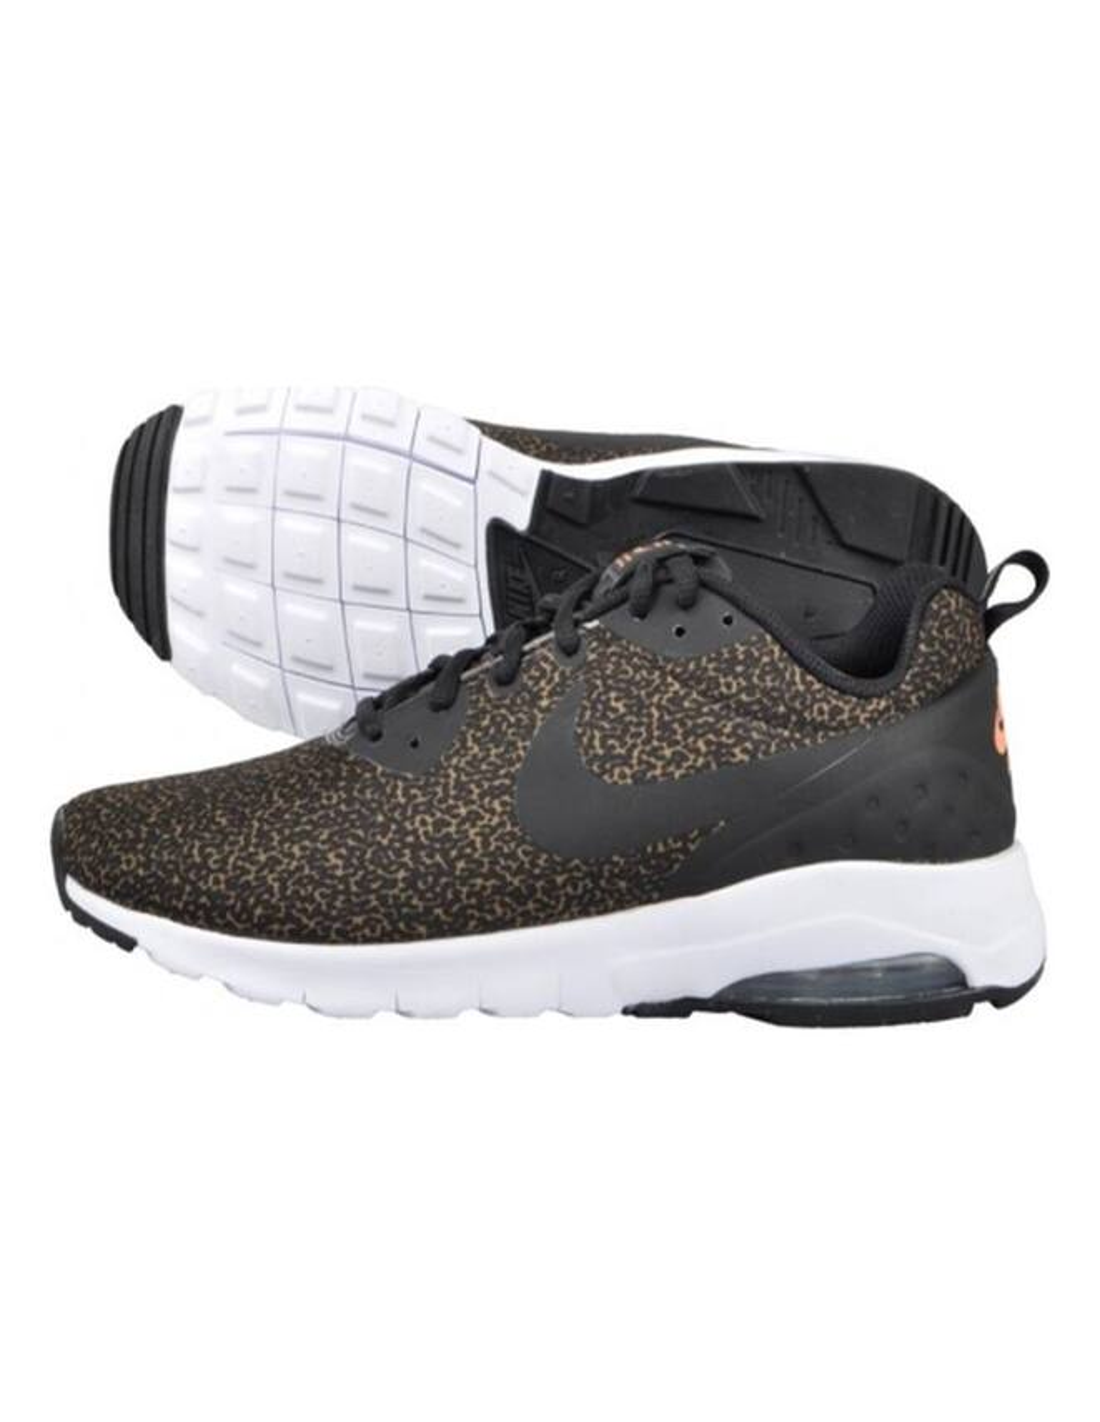 7f9ac33aa ᐈ Zapatillas Nike Air Max Motion Low – Atmosfera Sport©